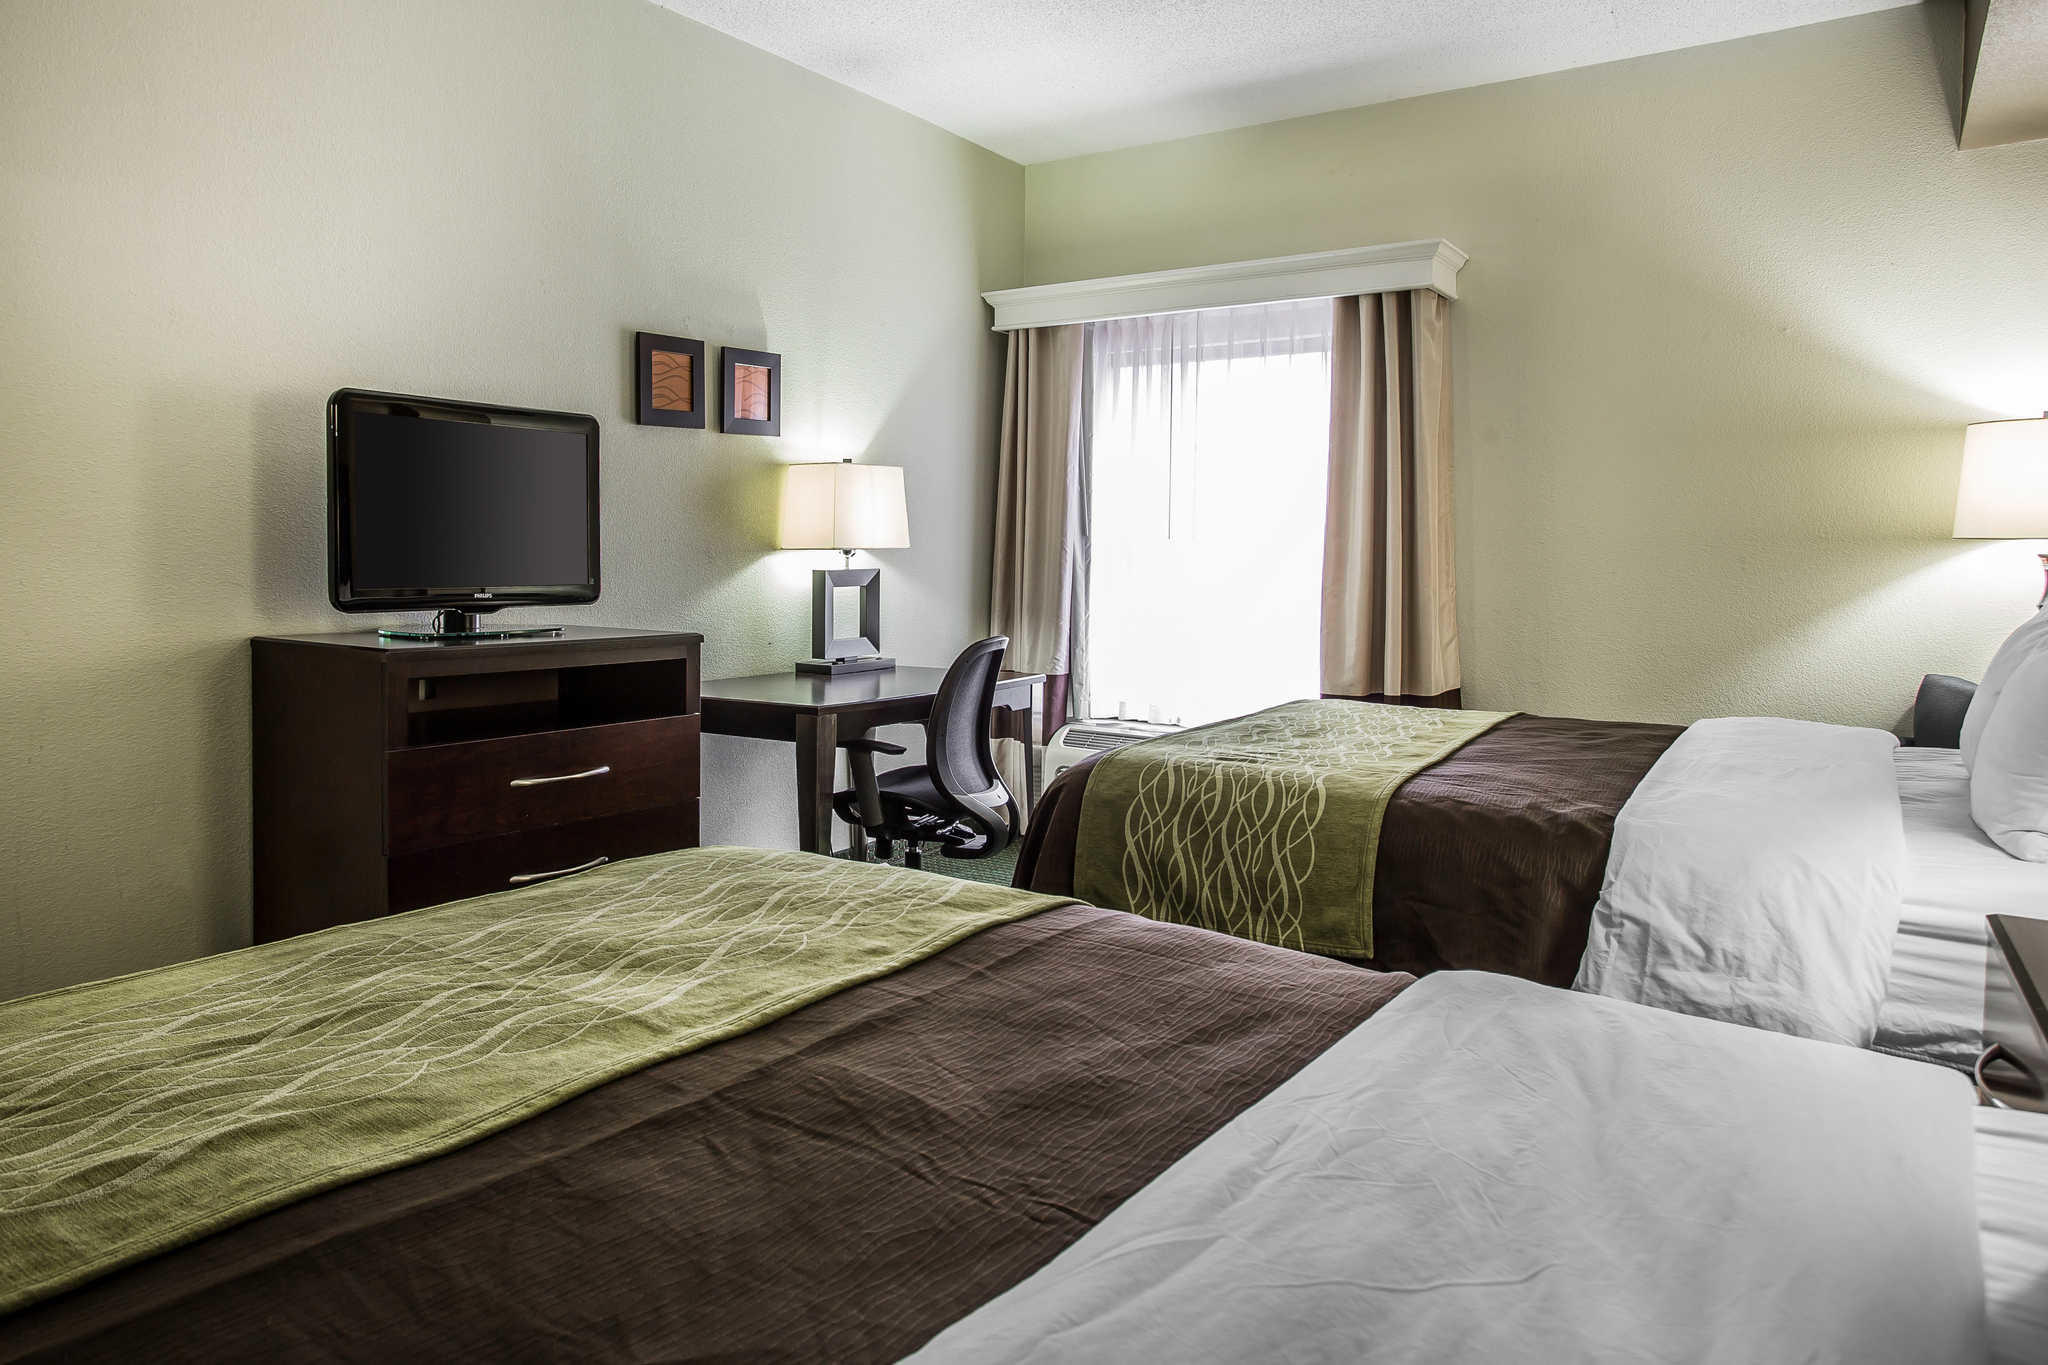 Comfort Inn & Suites Lake Norman image 5